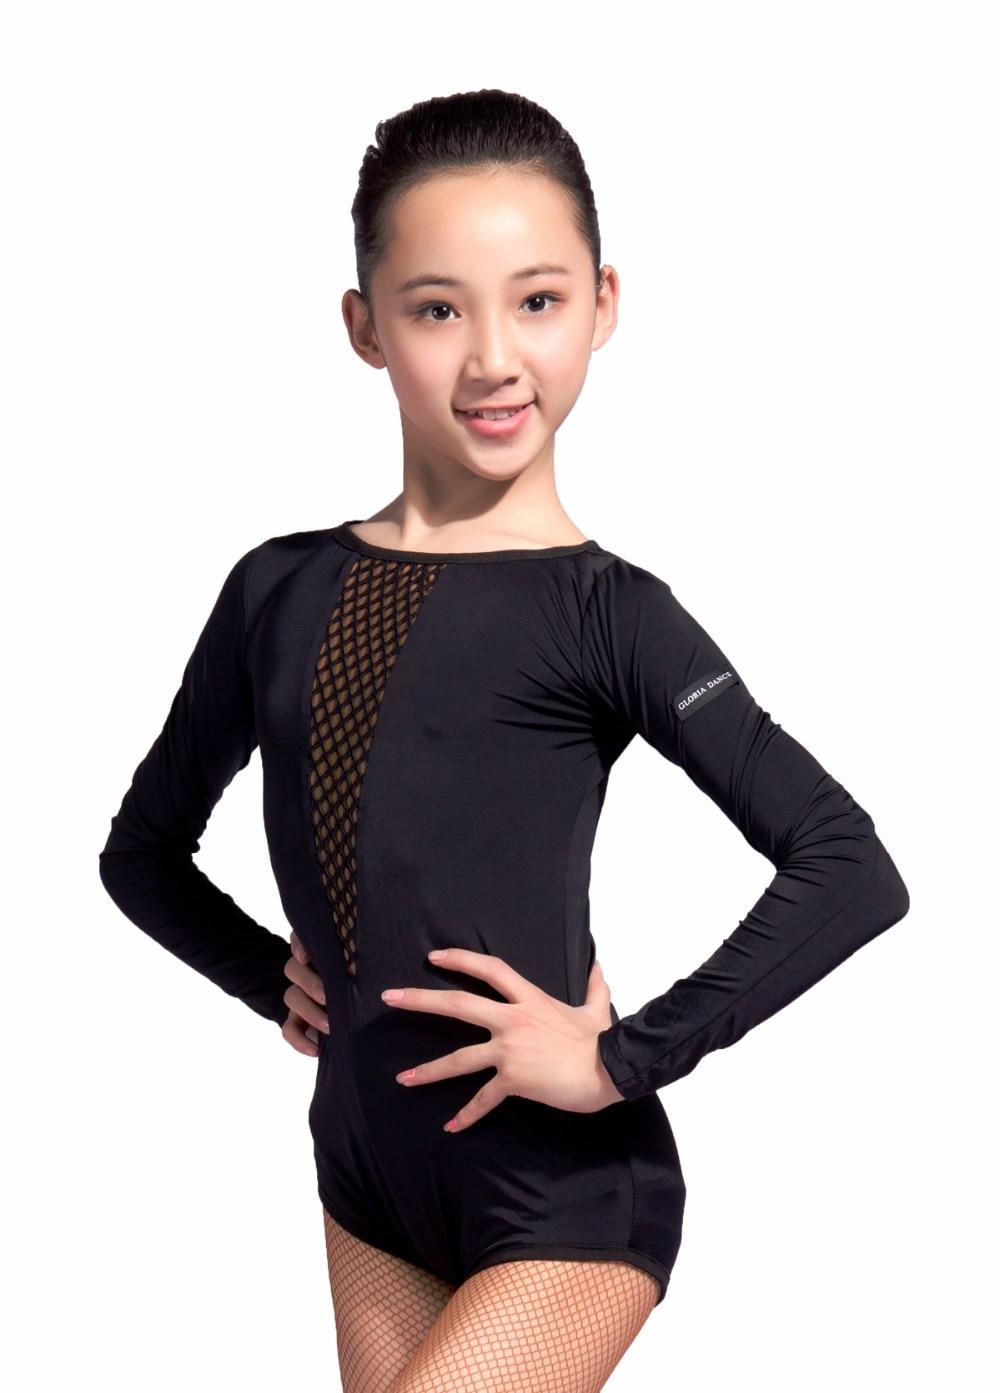 GD1021  Kid Latin Modern  Ballroom  Party Dance Professional  V Modelling Mesh Stitching Design Leotard  For Girl